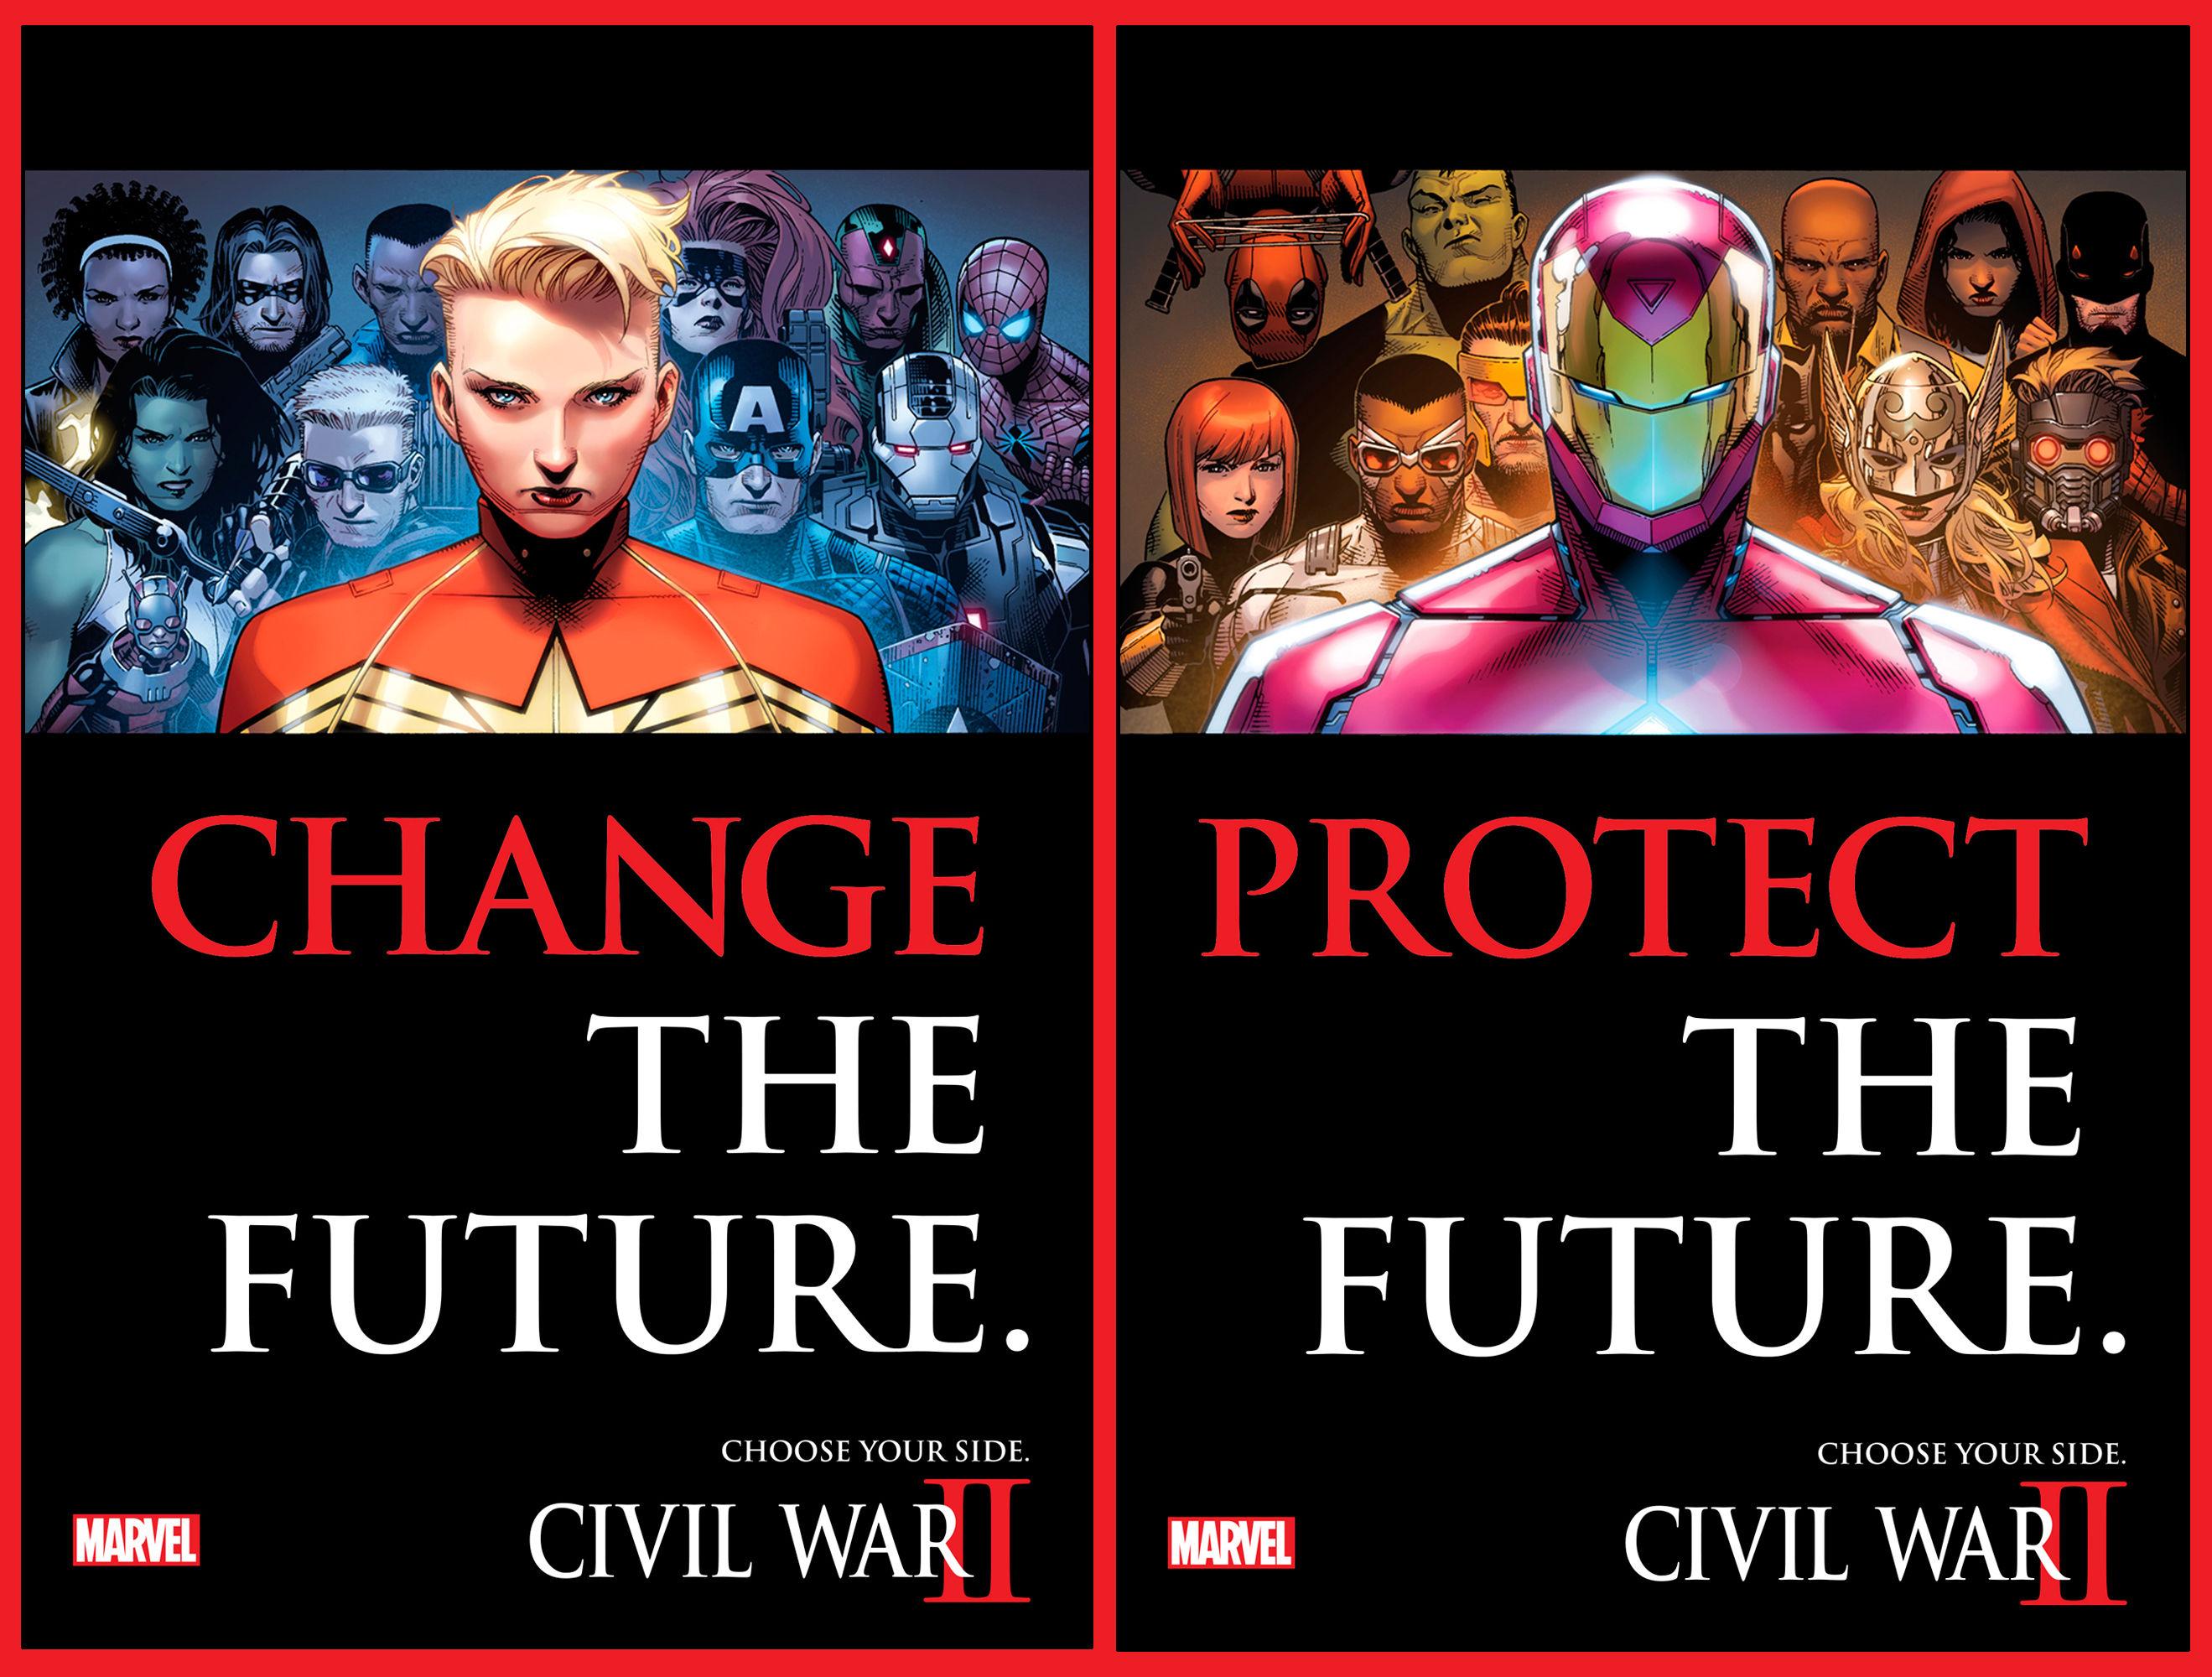 civil-war-2-both-teams